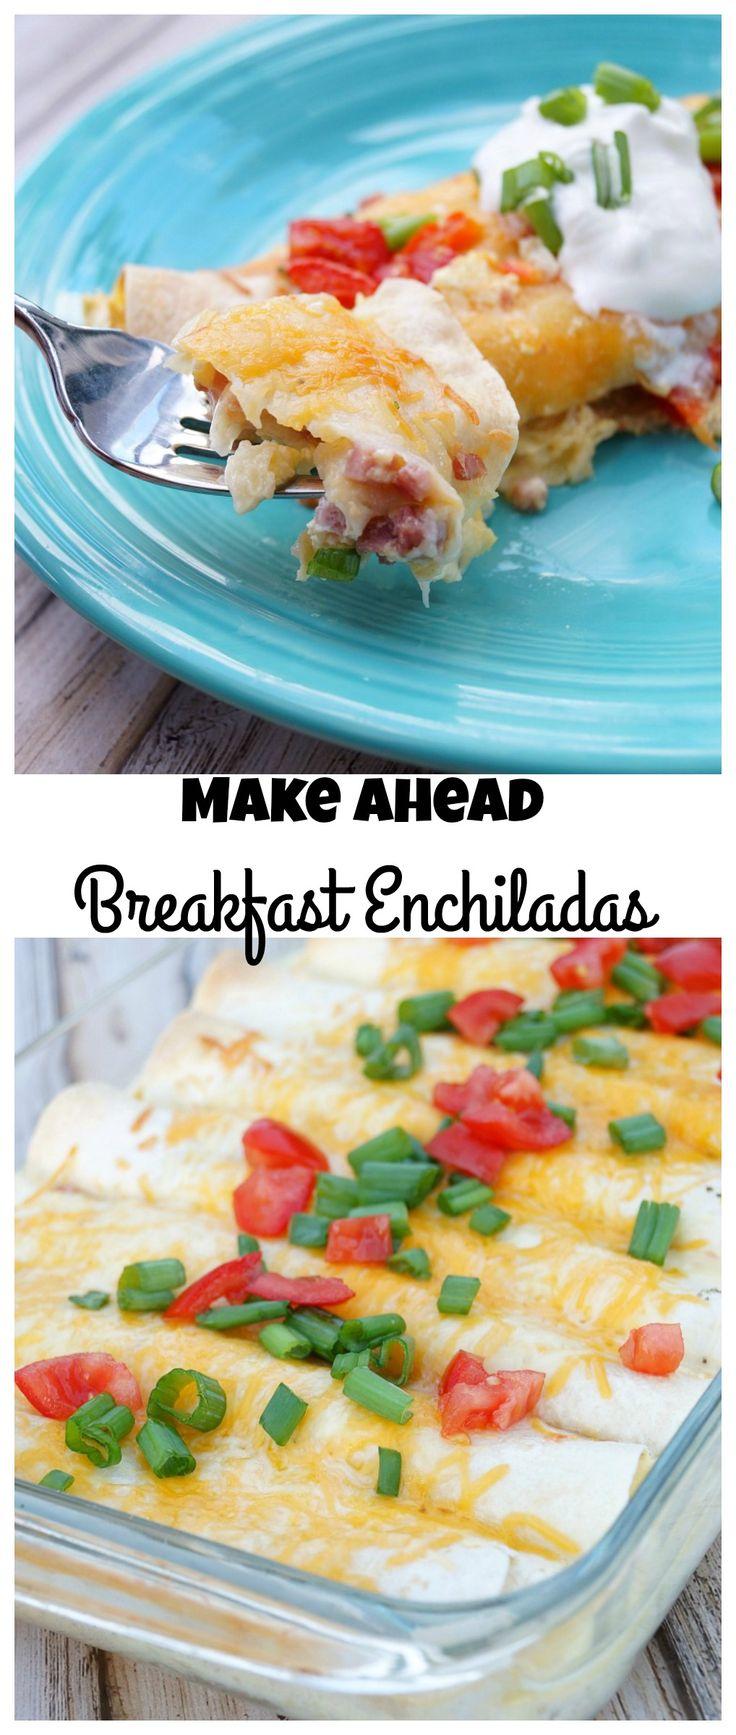 Make Ahead Breakfast Enchiladas #ad @starbucks #makeitmerrier #coffee